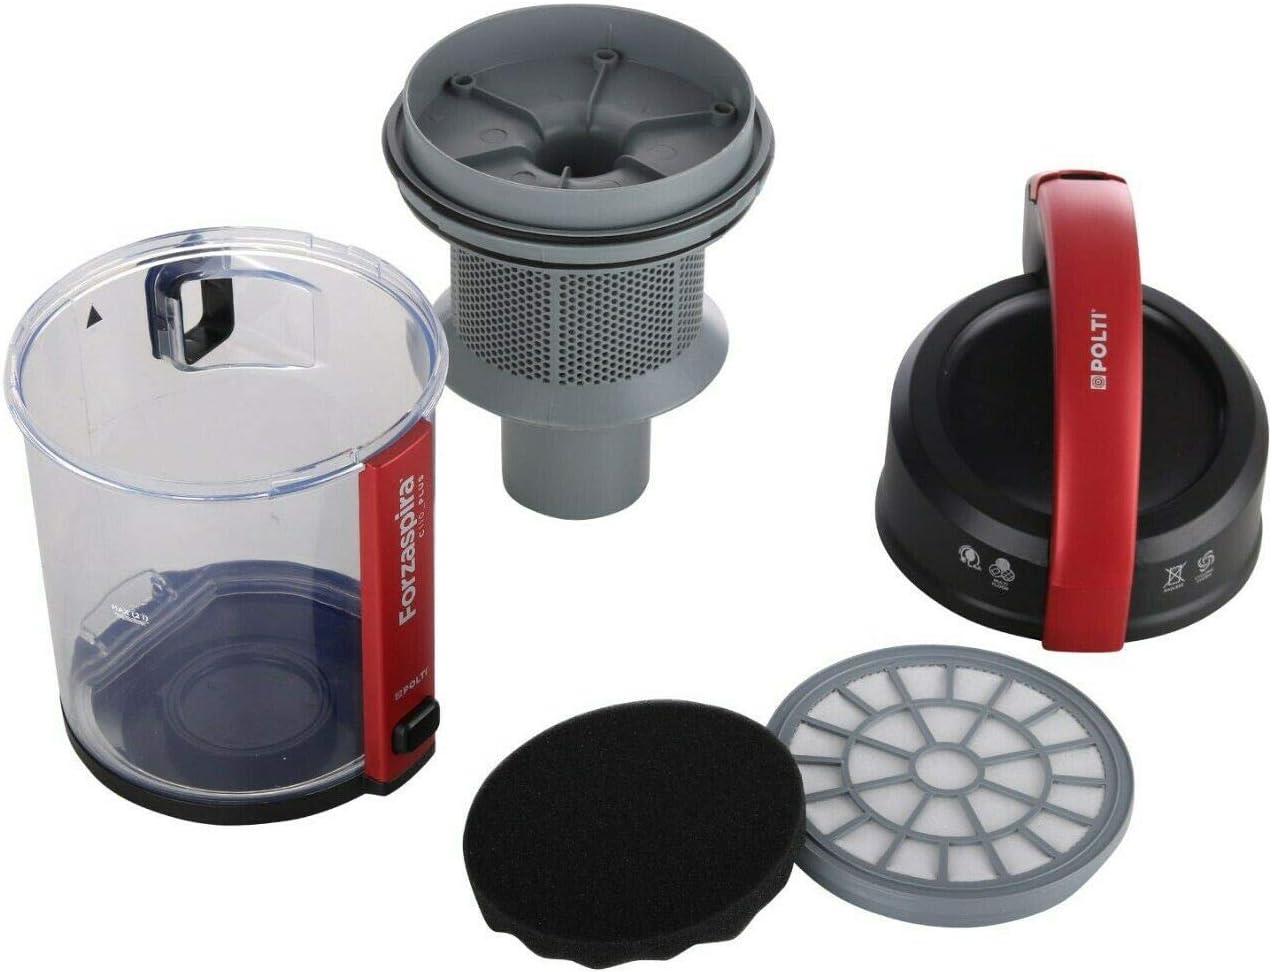 Polti depósito depósito filtro polvo aspirador Forzaspira C110 Plus: Amazon.es: Hogar